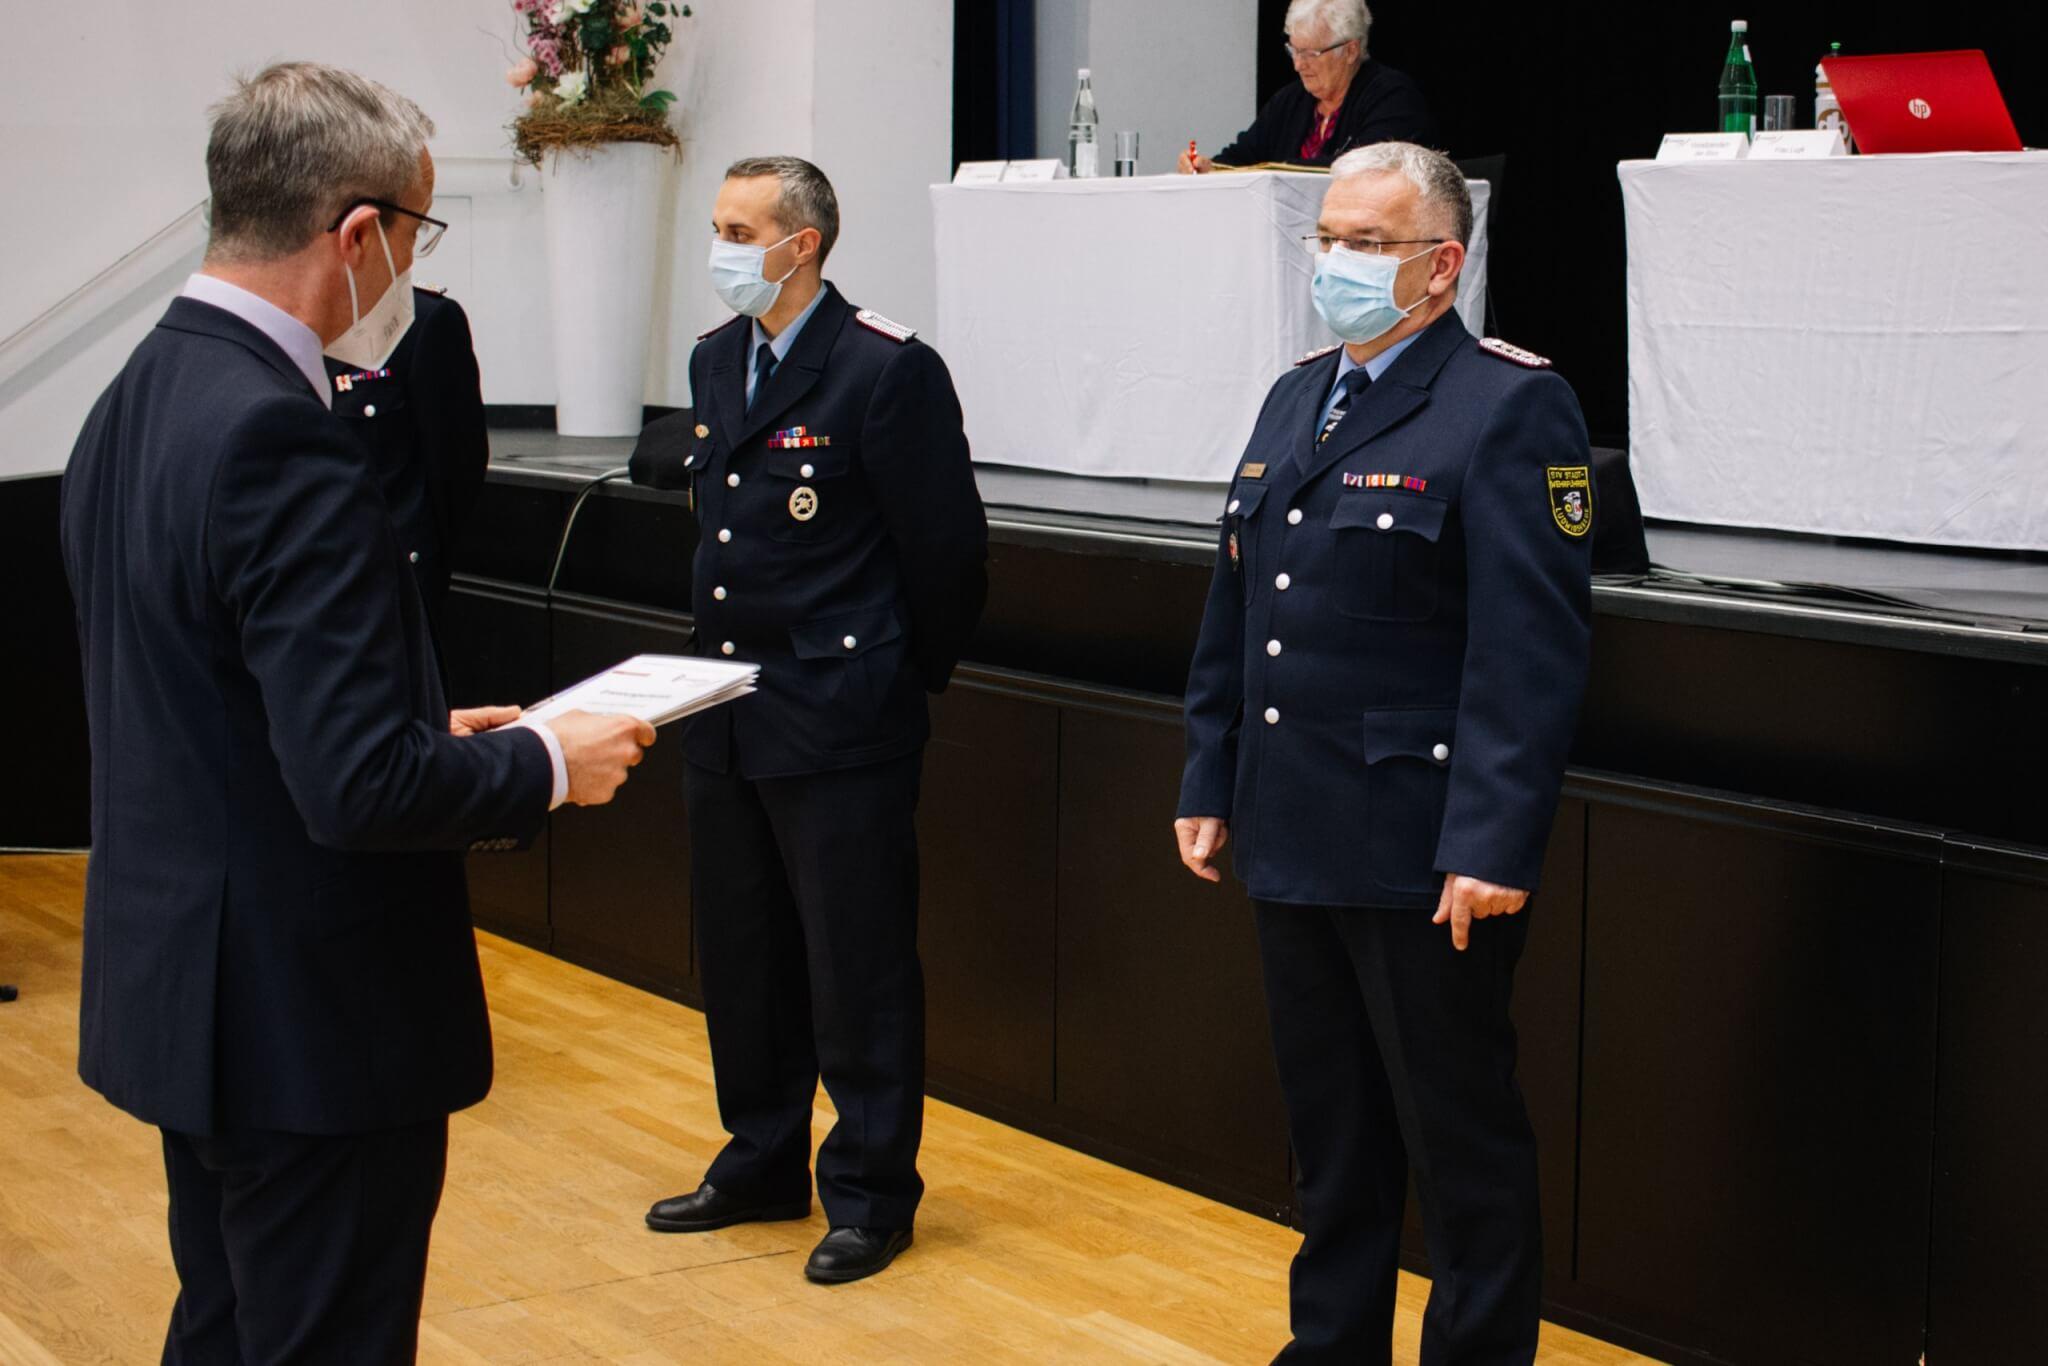 Stadtverordnetenversammlung-12